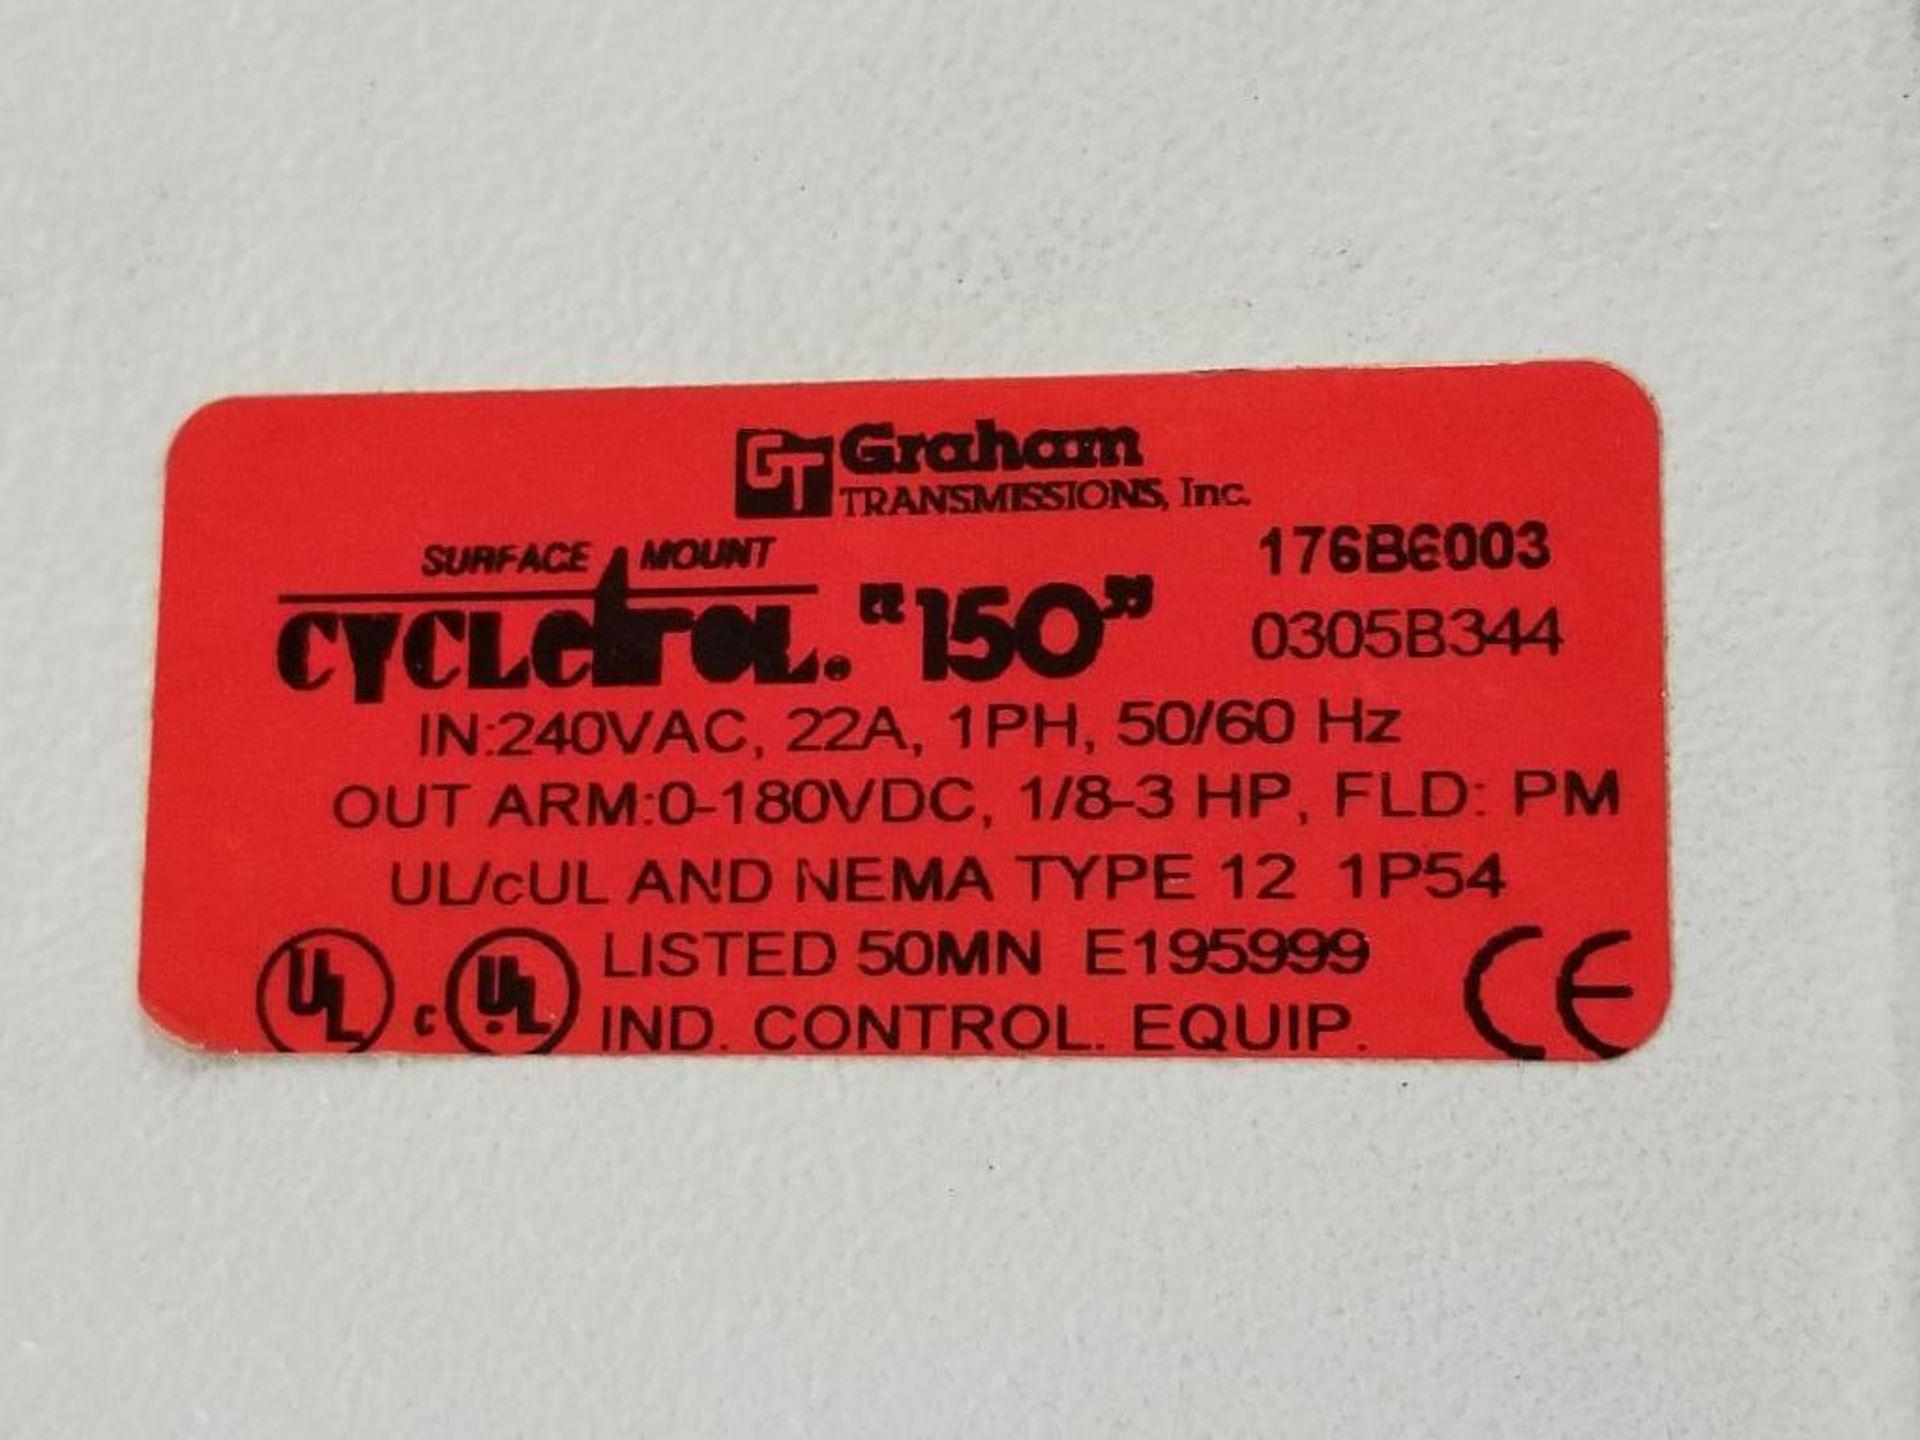 Graham Transmissions Cycletrol 150 DC motor controller. 176B6003. - Image 2 of 2